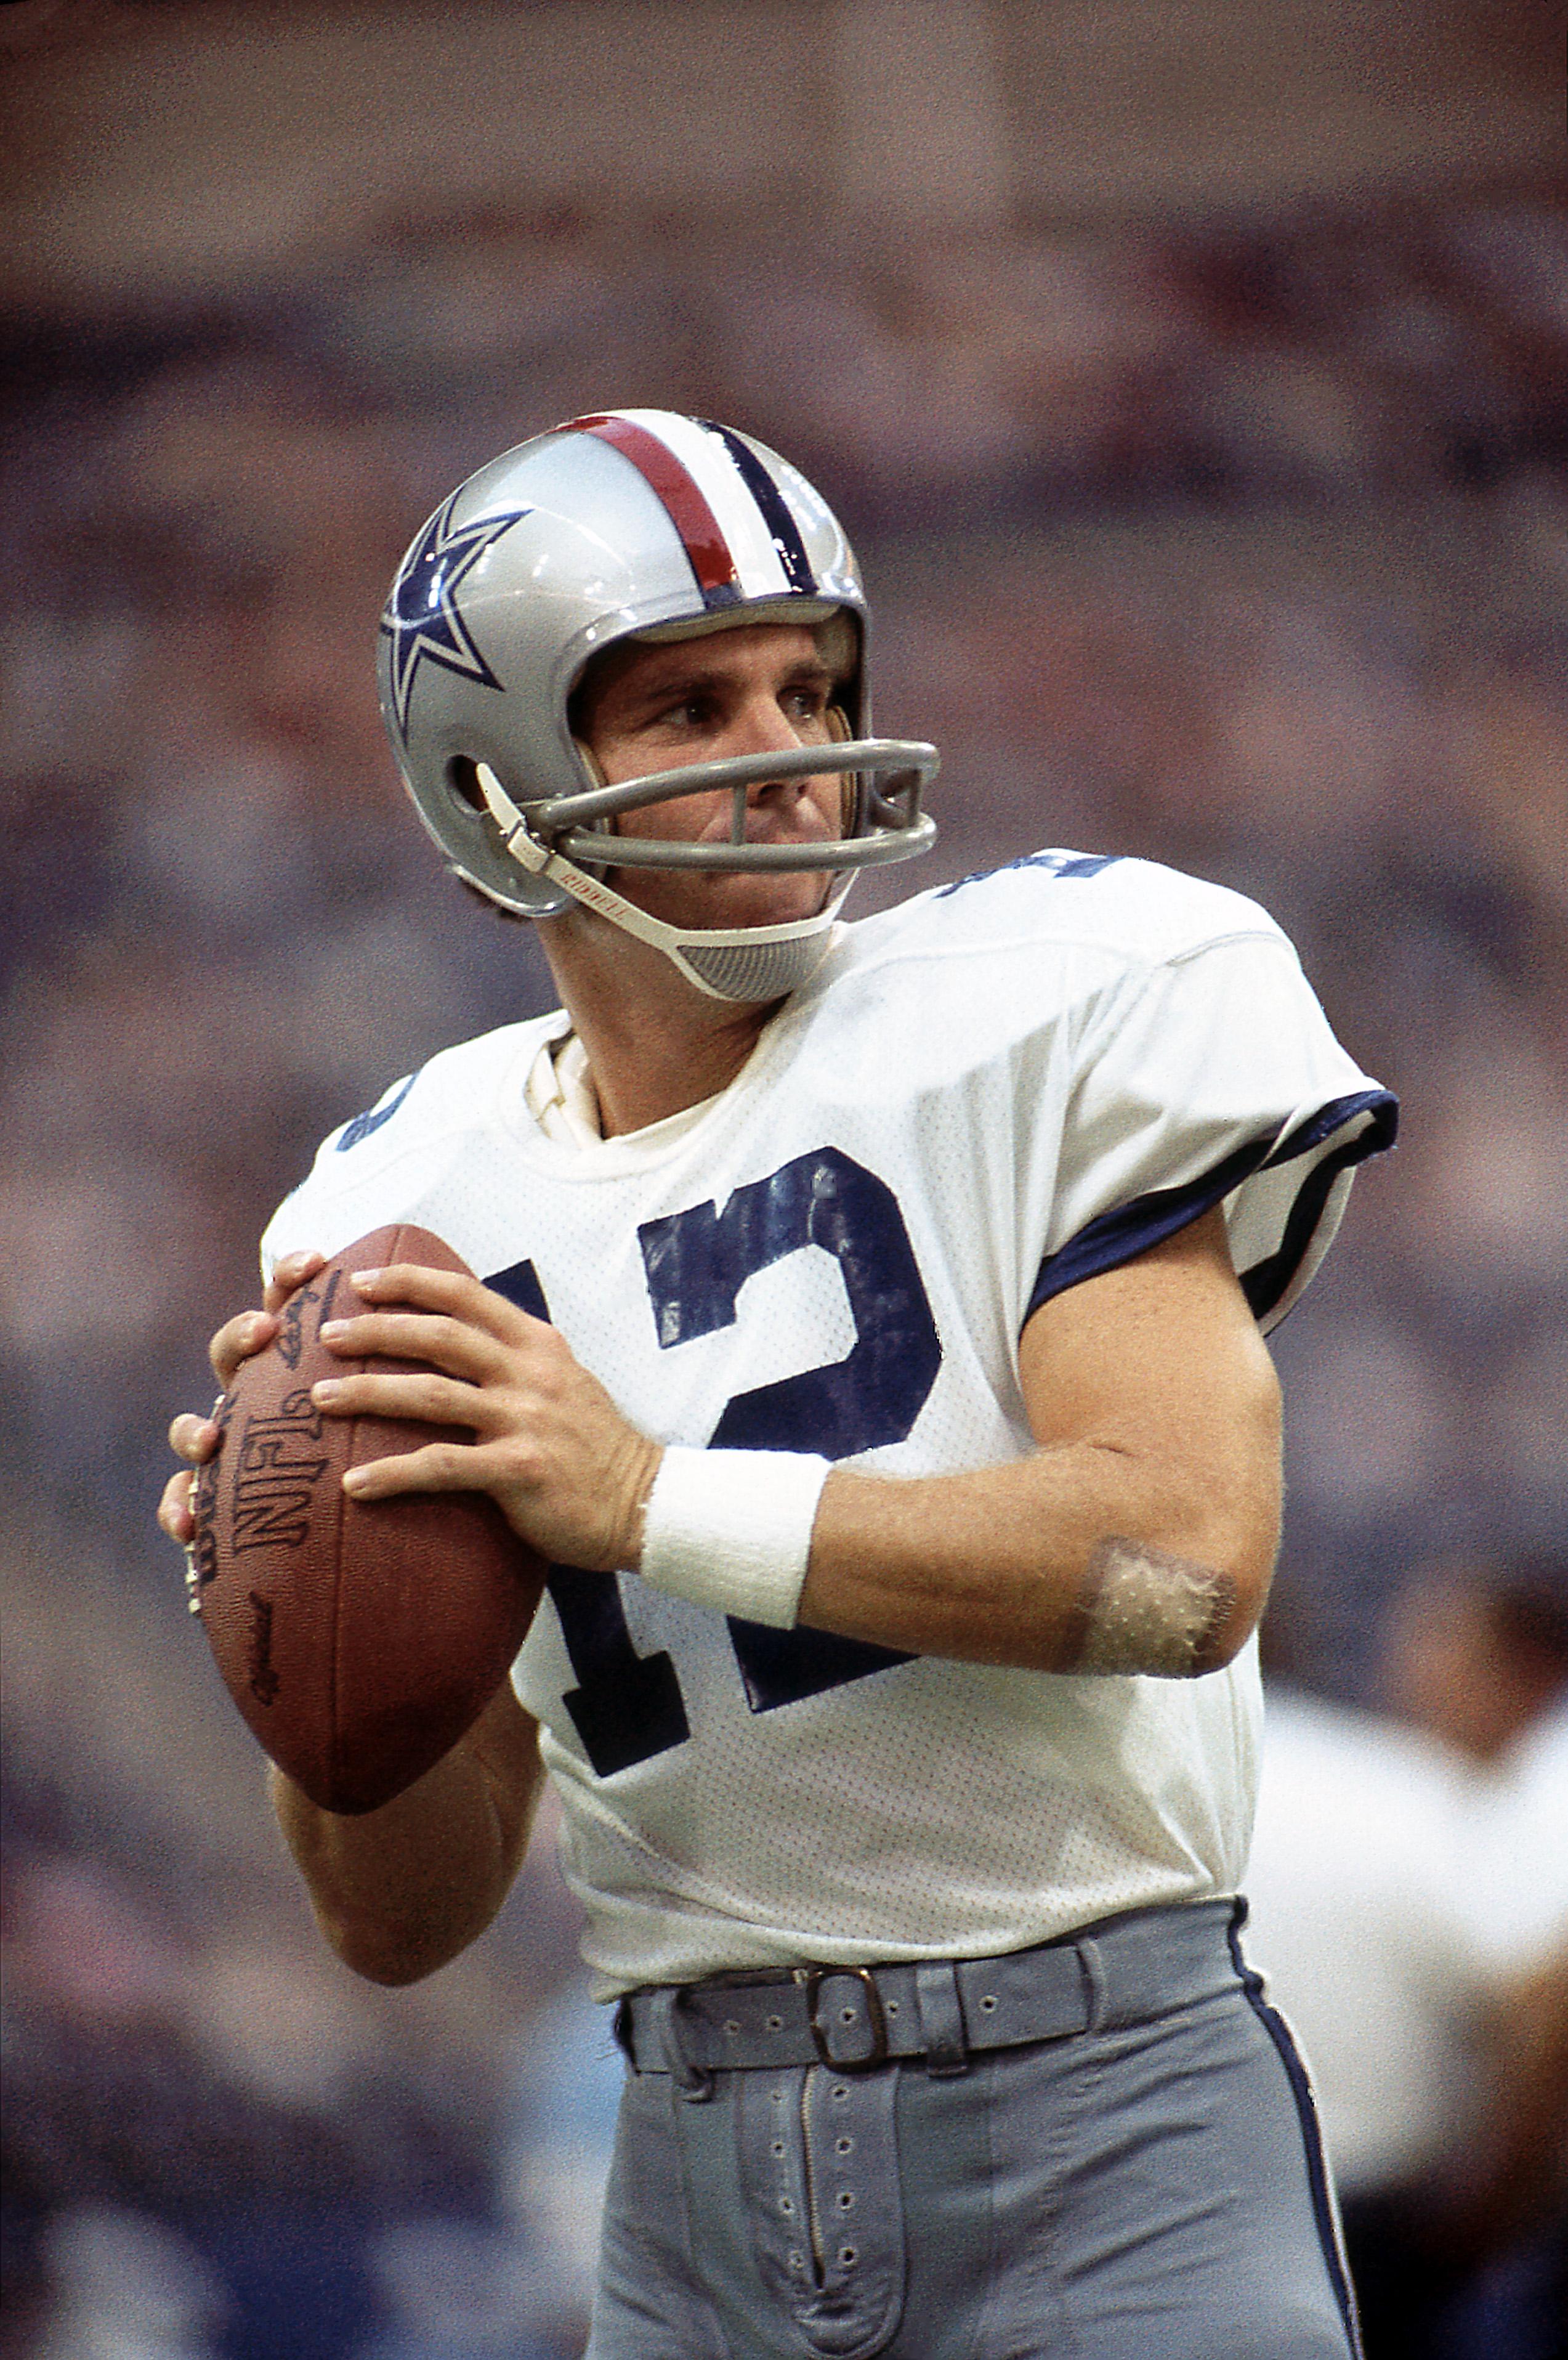 Roger Staubach, Dallas Cowboys Gameplay On Monday Night Football